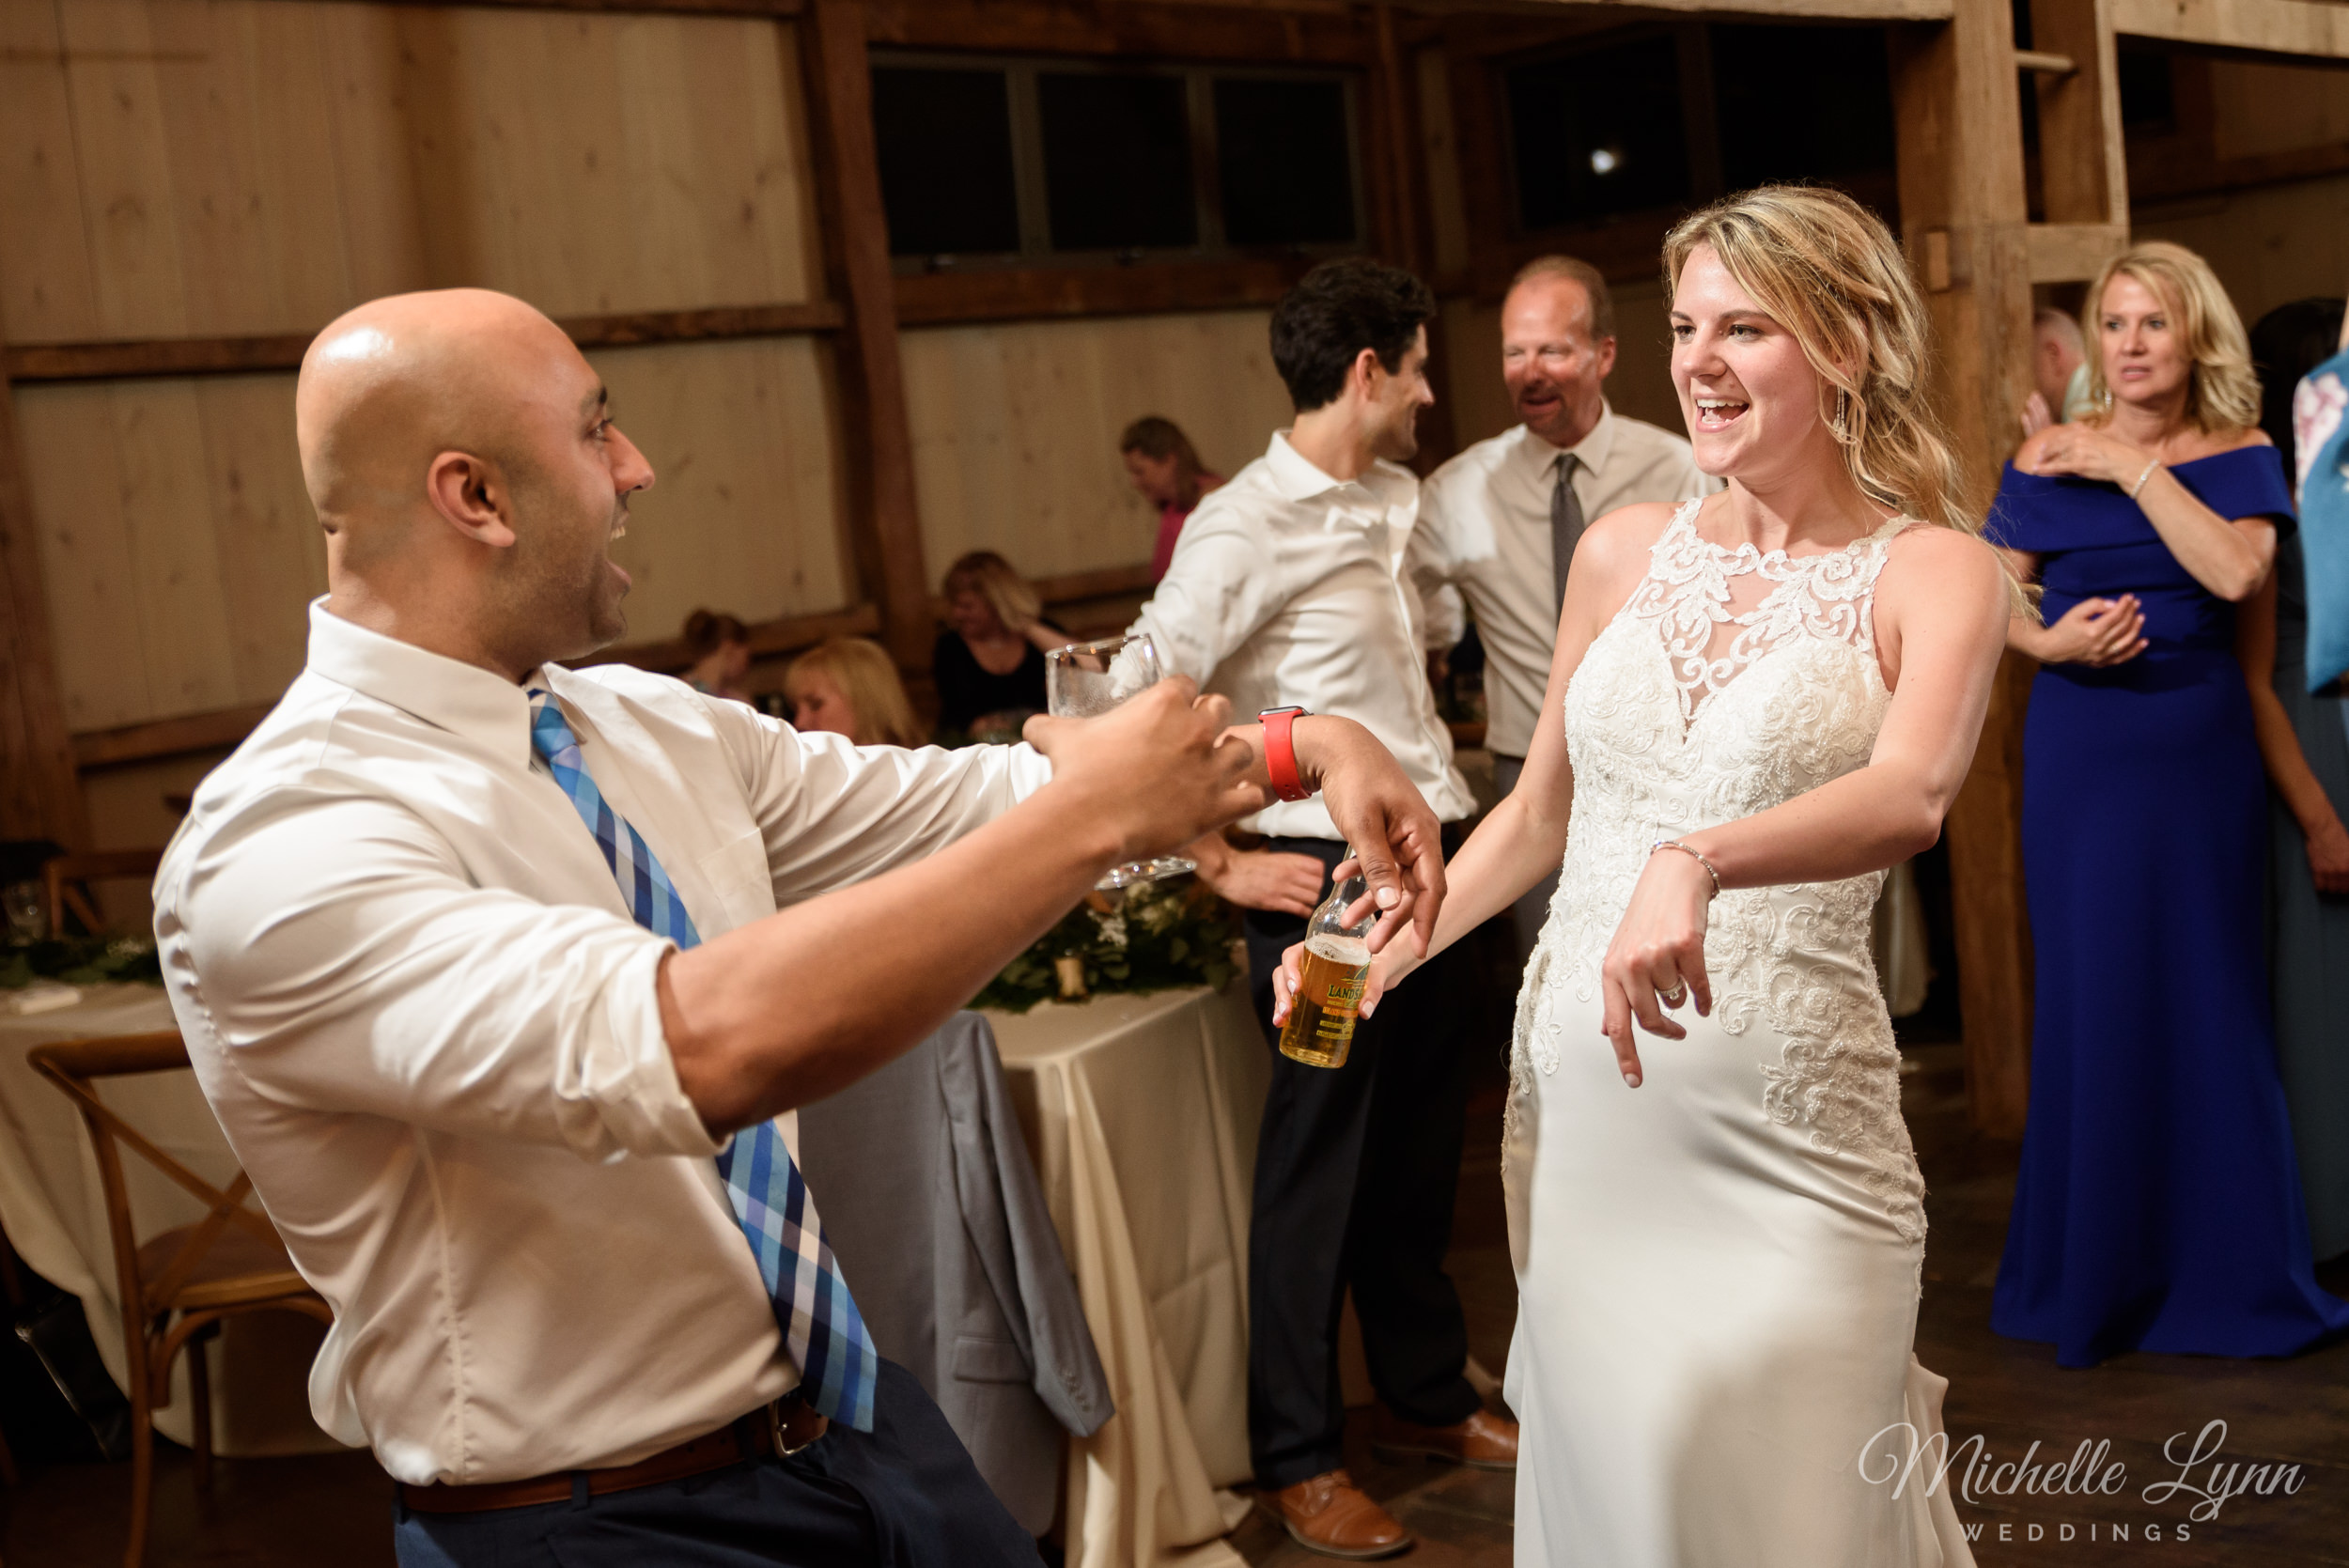 mlw-the-farm-bakery-and-events-wedding-photos-87.jpg